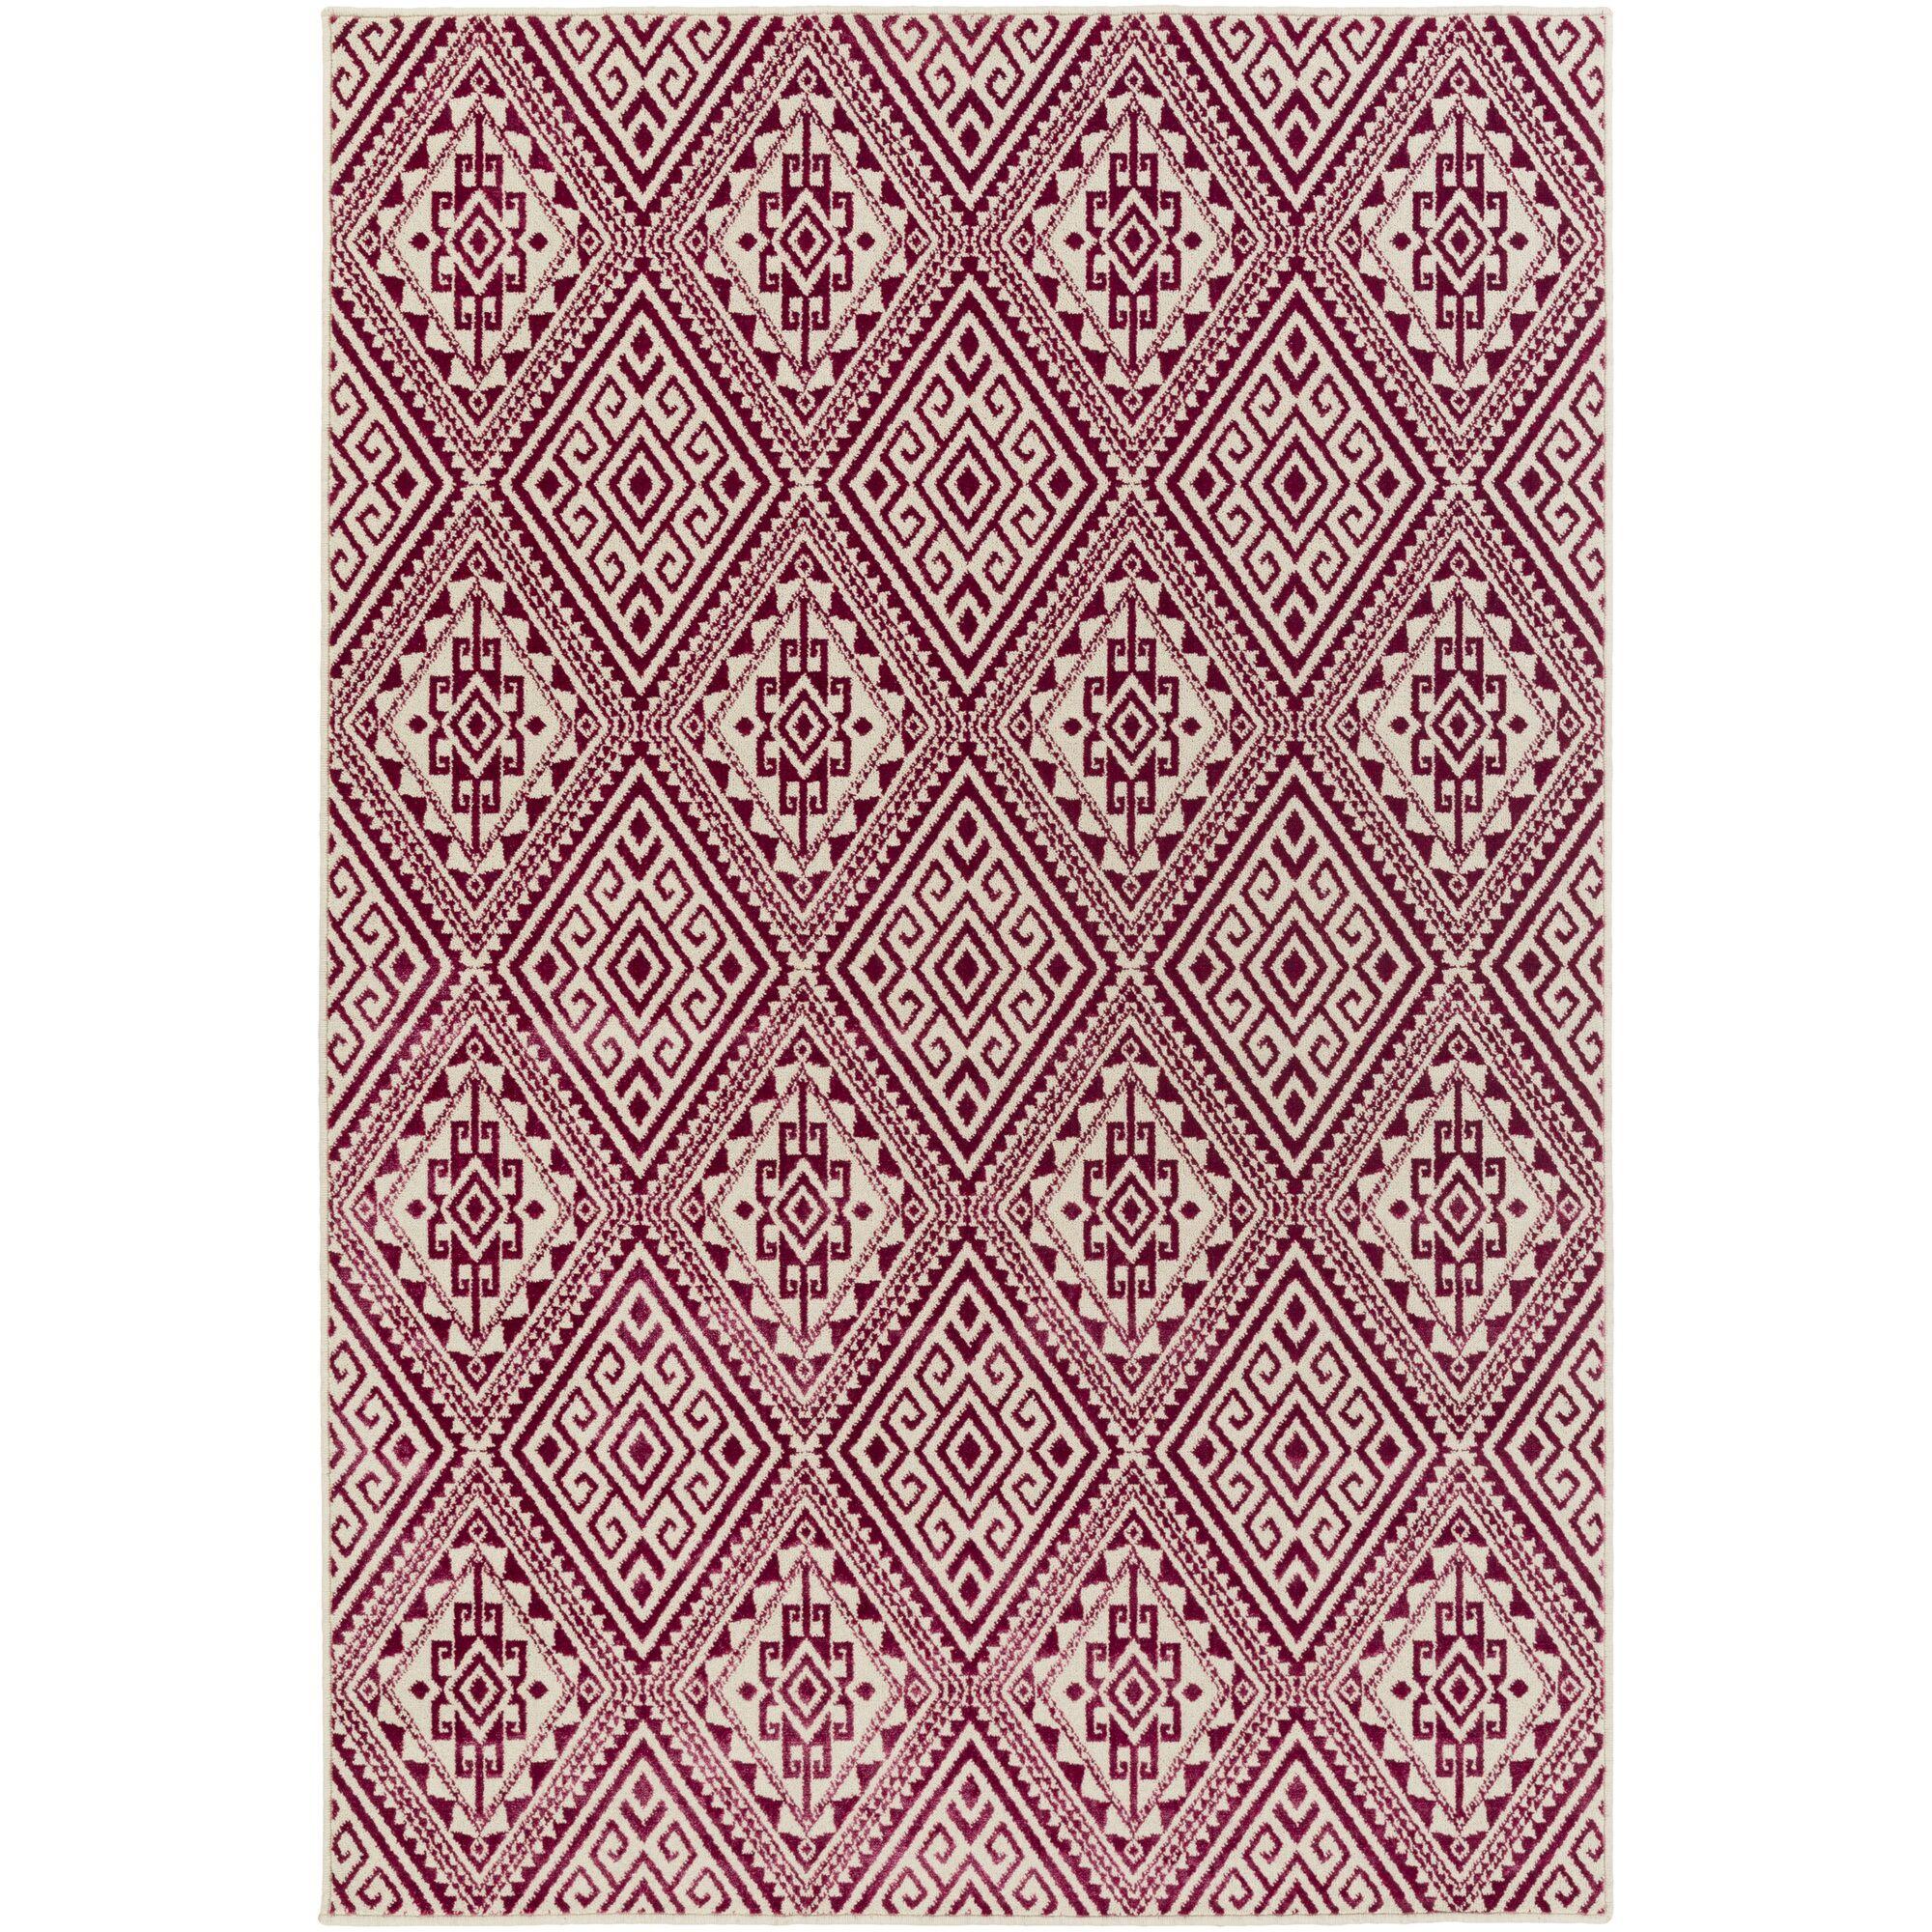 Zita Beige/Pink Area Rug Rug Size: Rectangle 5'3